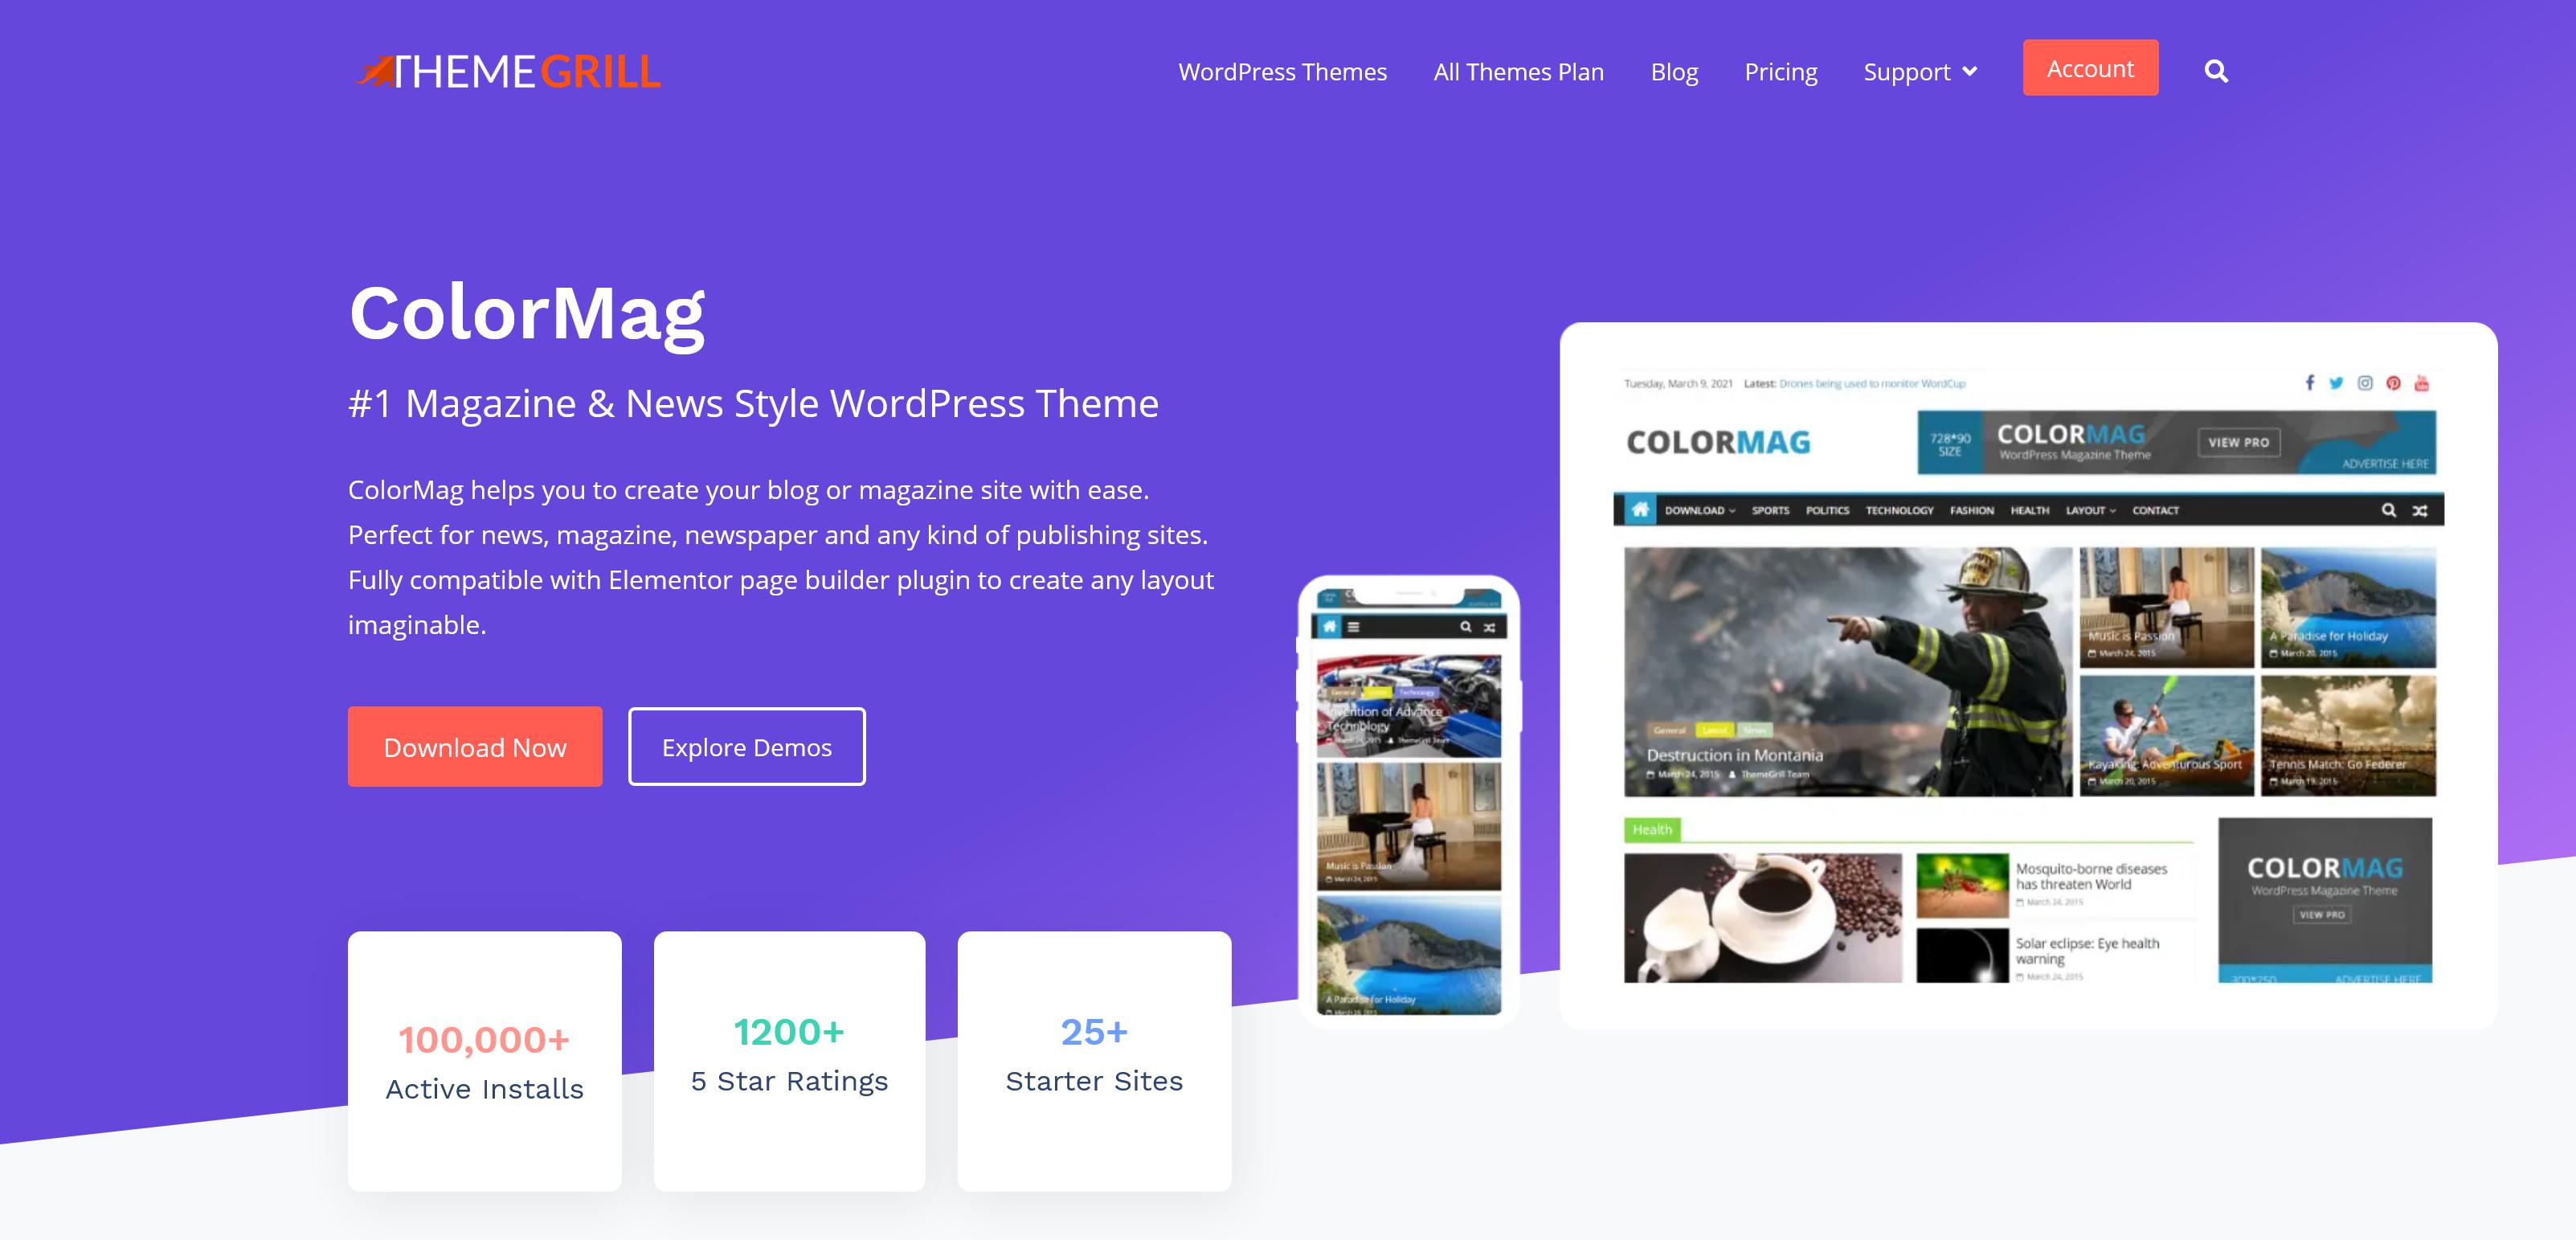 ColorMag Pro 3.1.4 – Magazine & News Style WordPress Theme